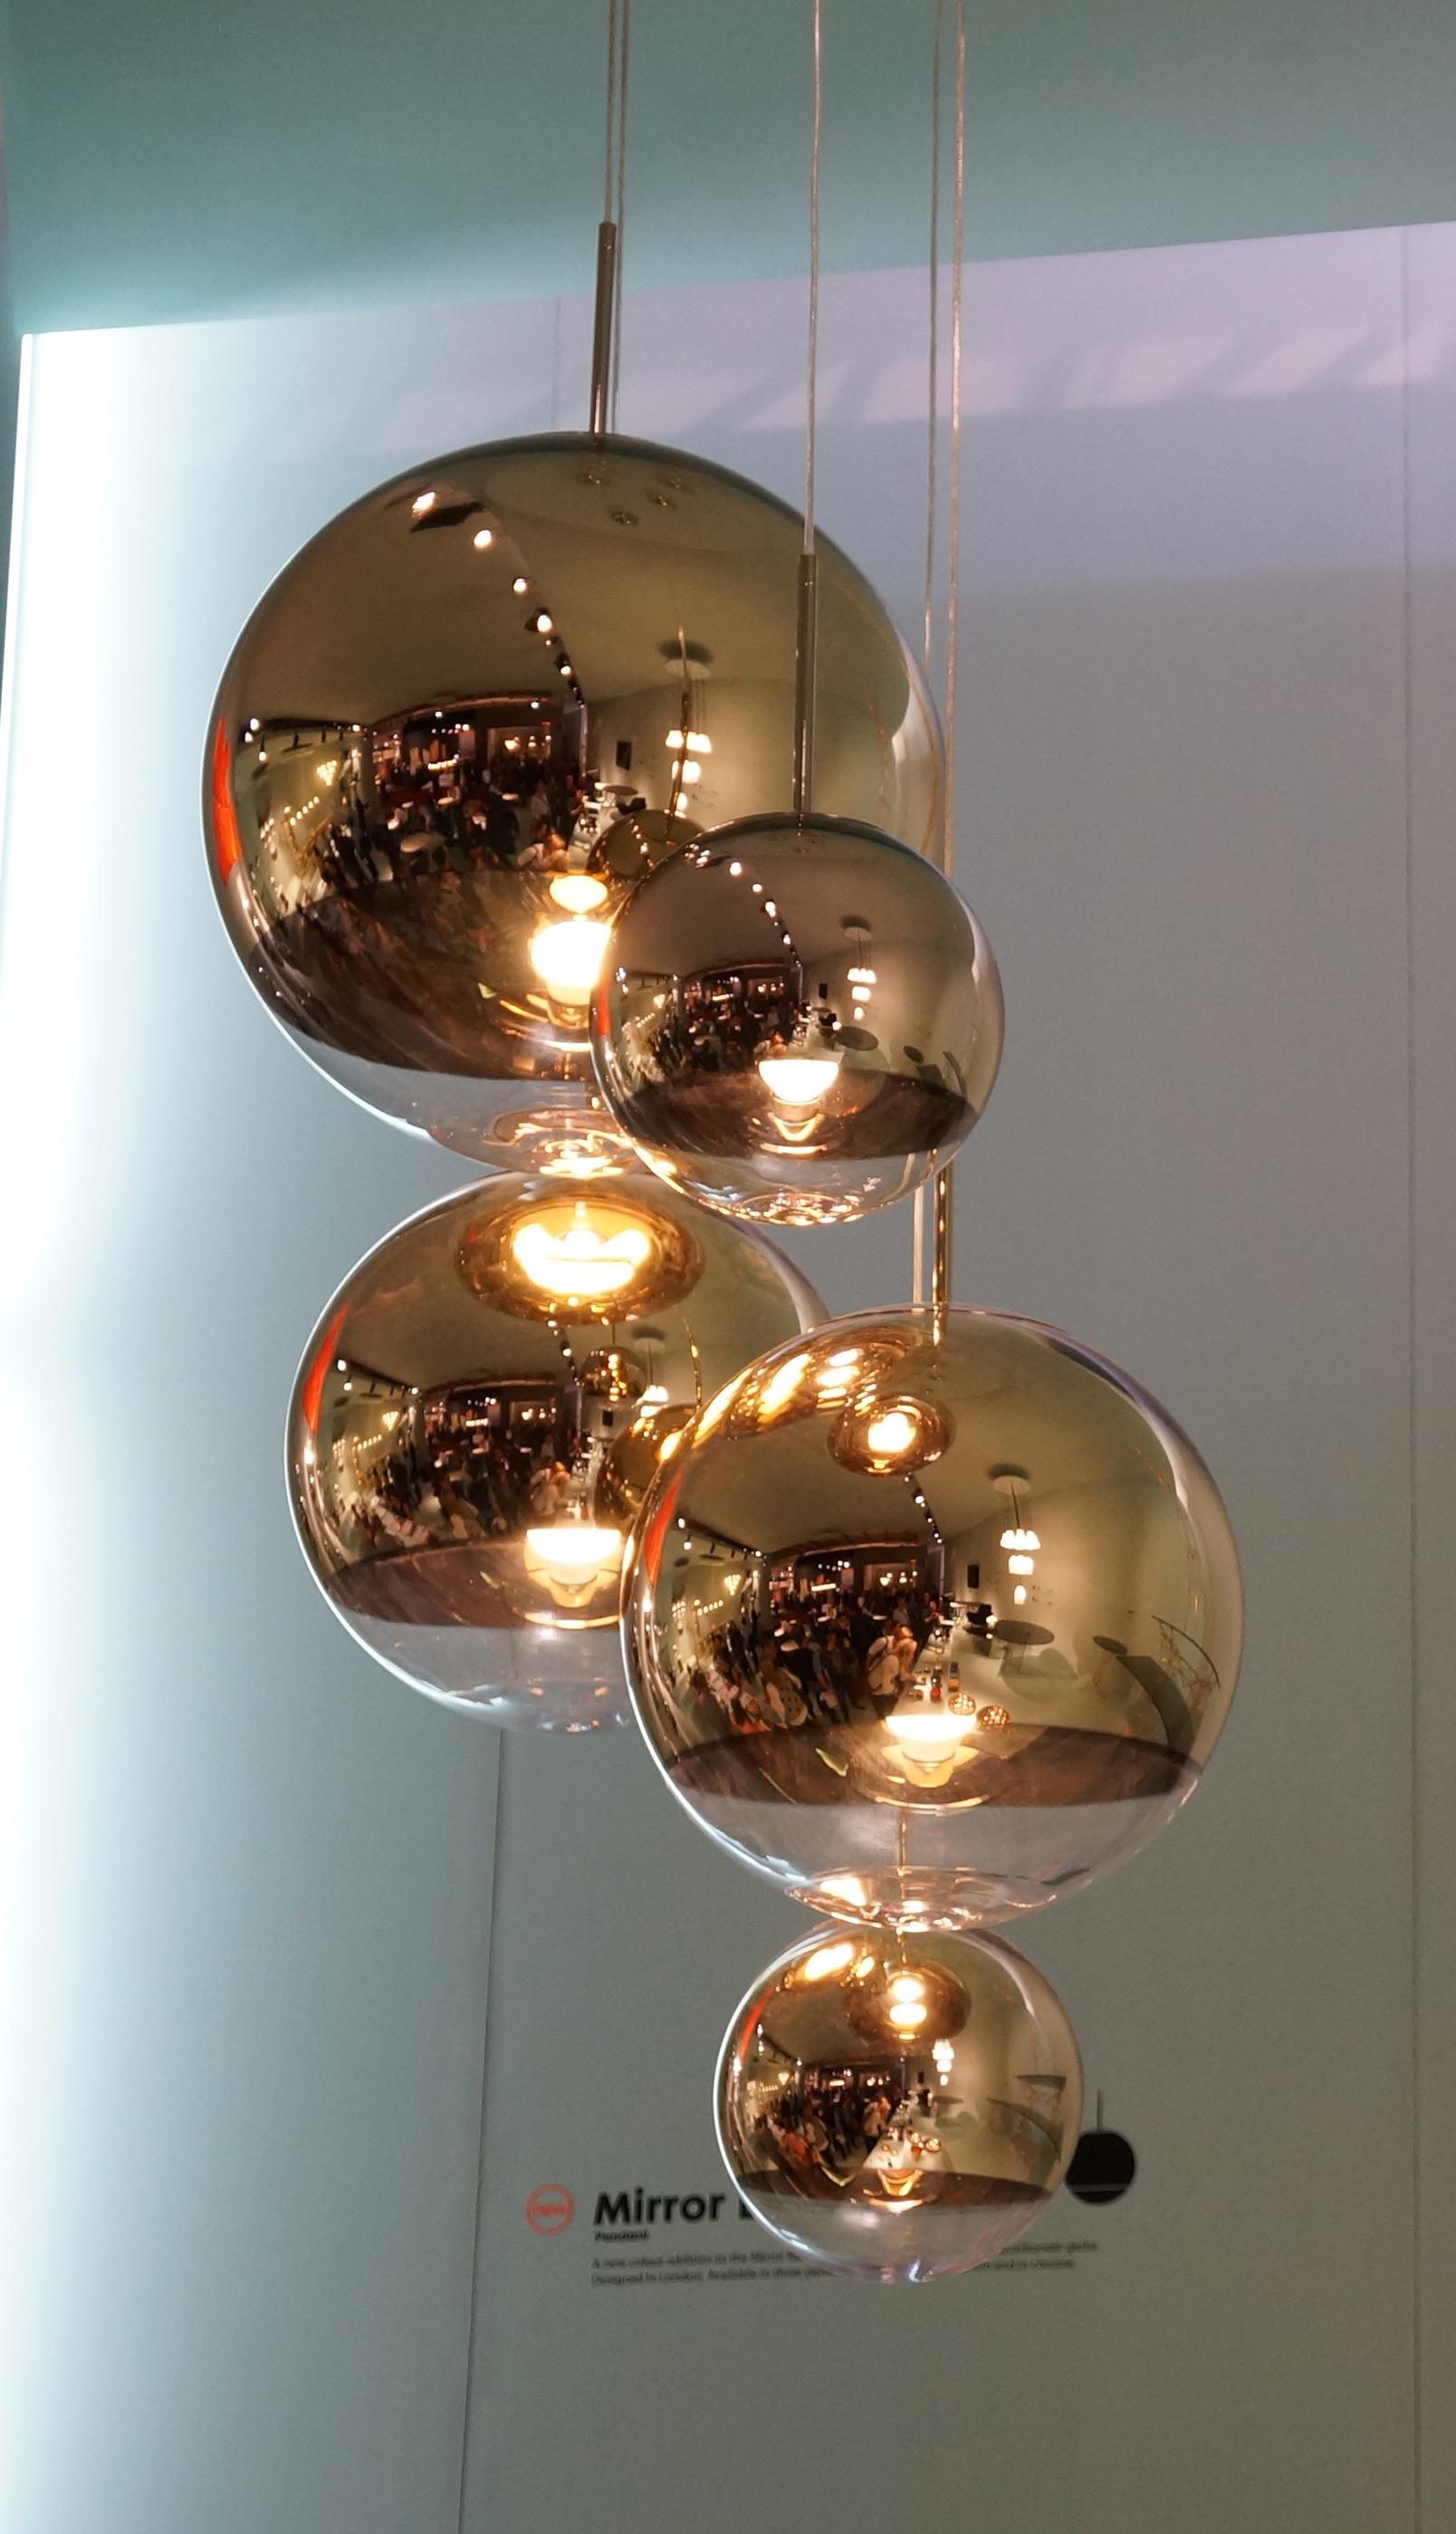 TD_Milano_mirrorball_gold